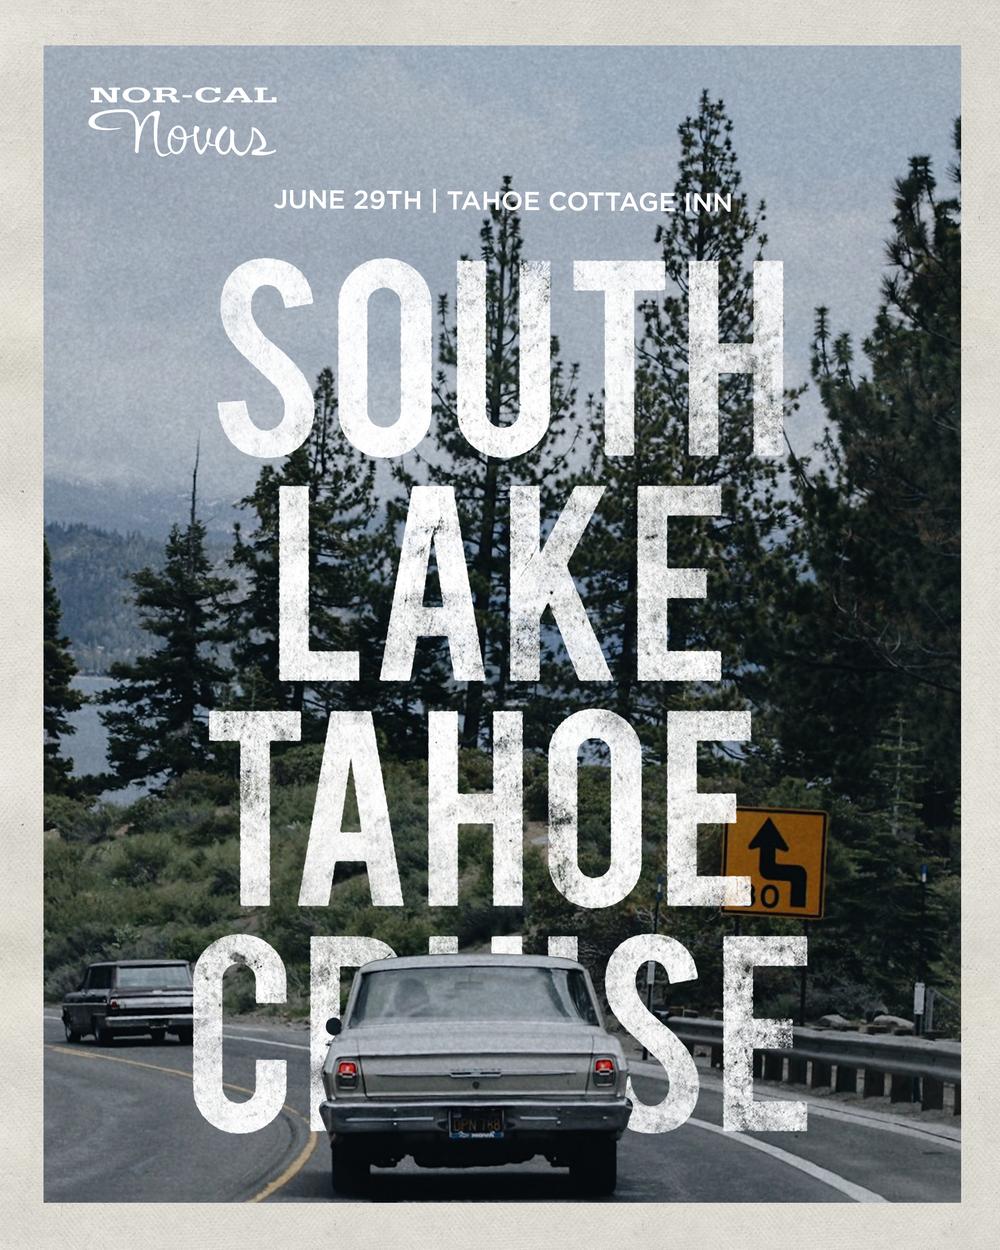 NCN_Tahoe_Cruise_IG_062418.png